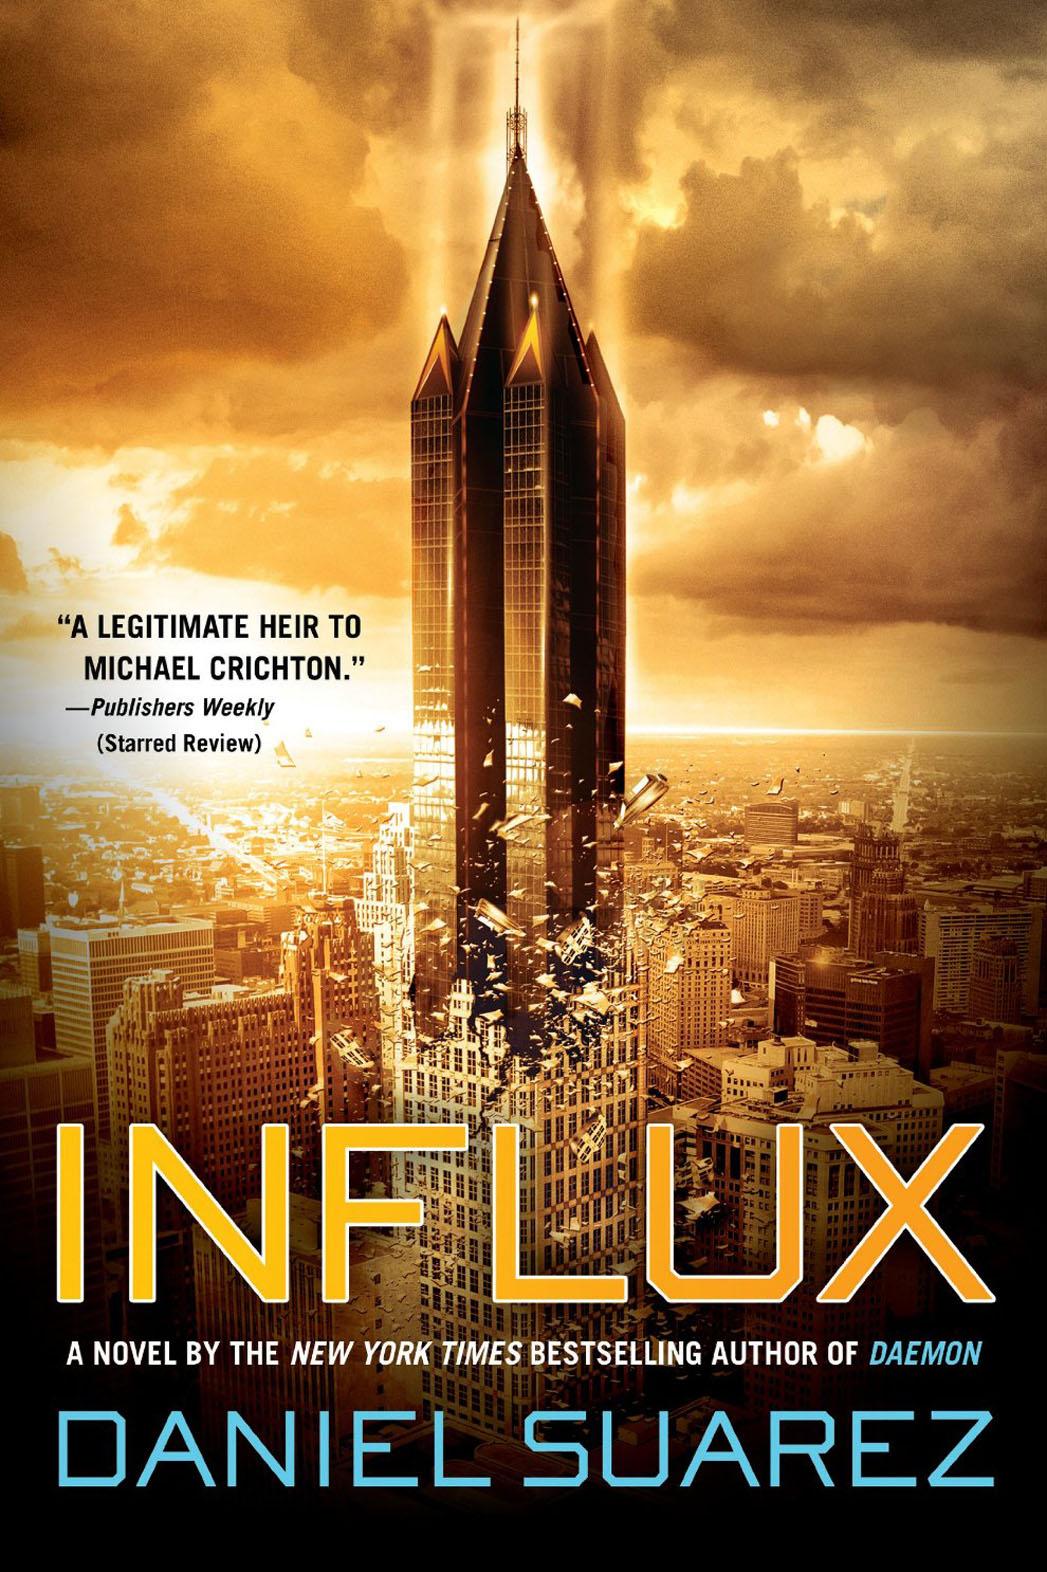 Influx Daniel Suarez Book Cover - P 2013